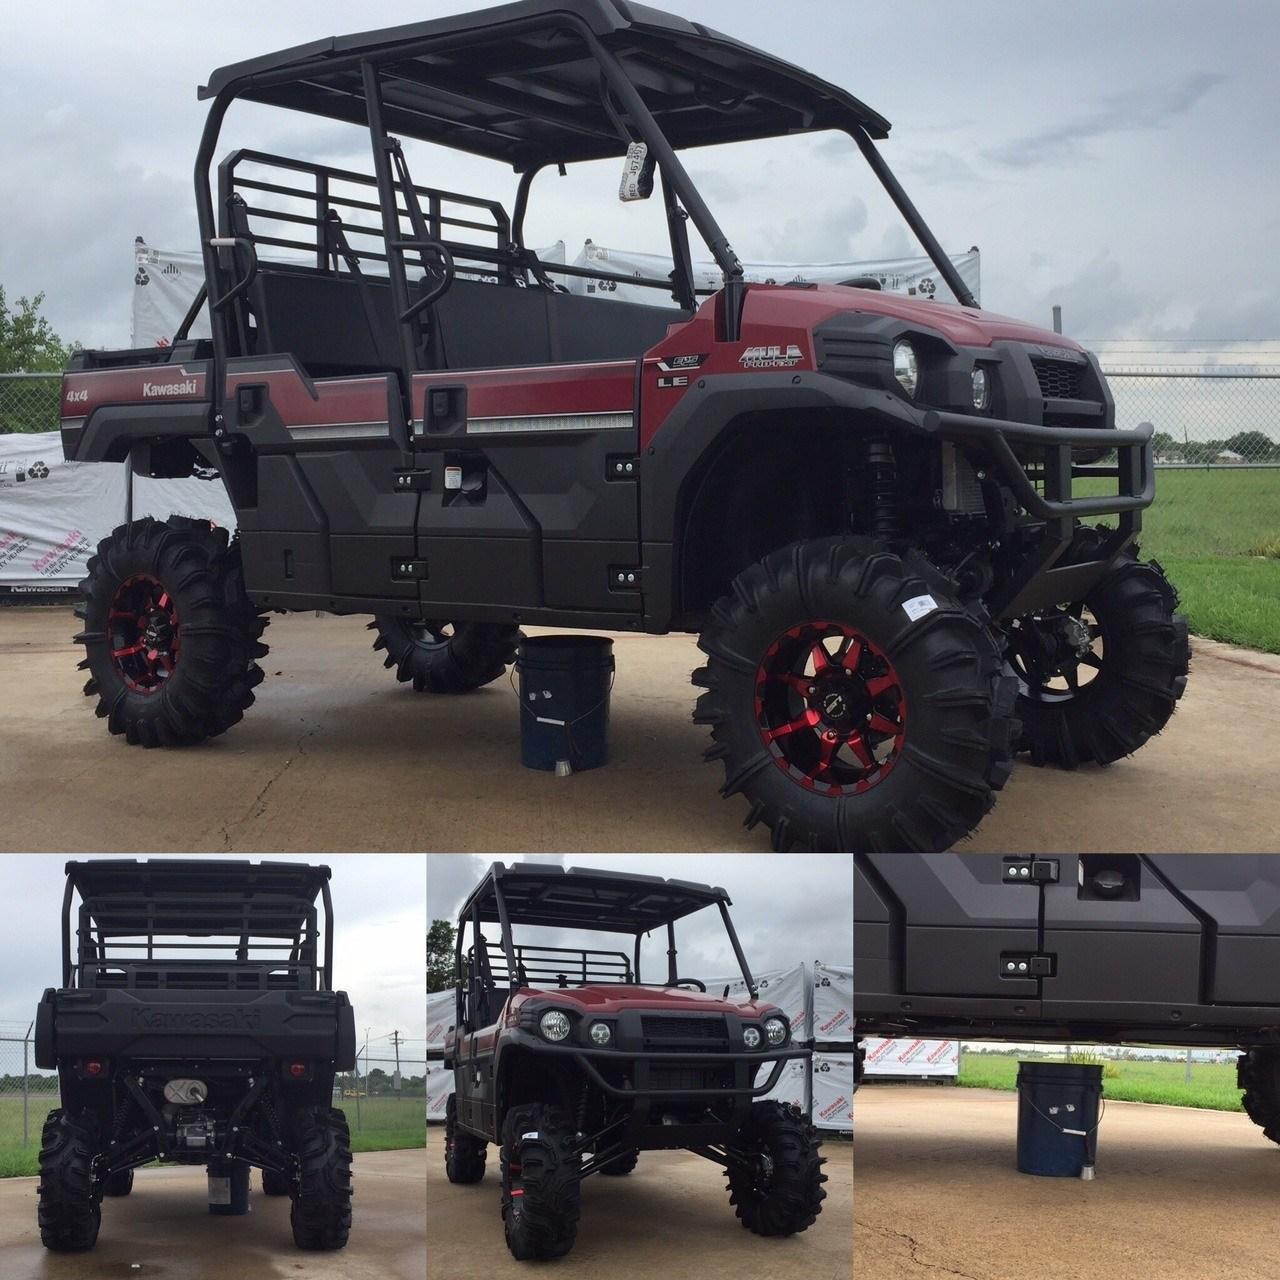 2016 Kawasaki Mule Pro-FXT EPS LE in La Marque, Texas